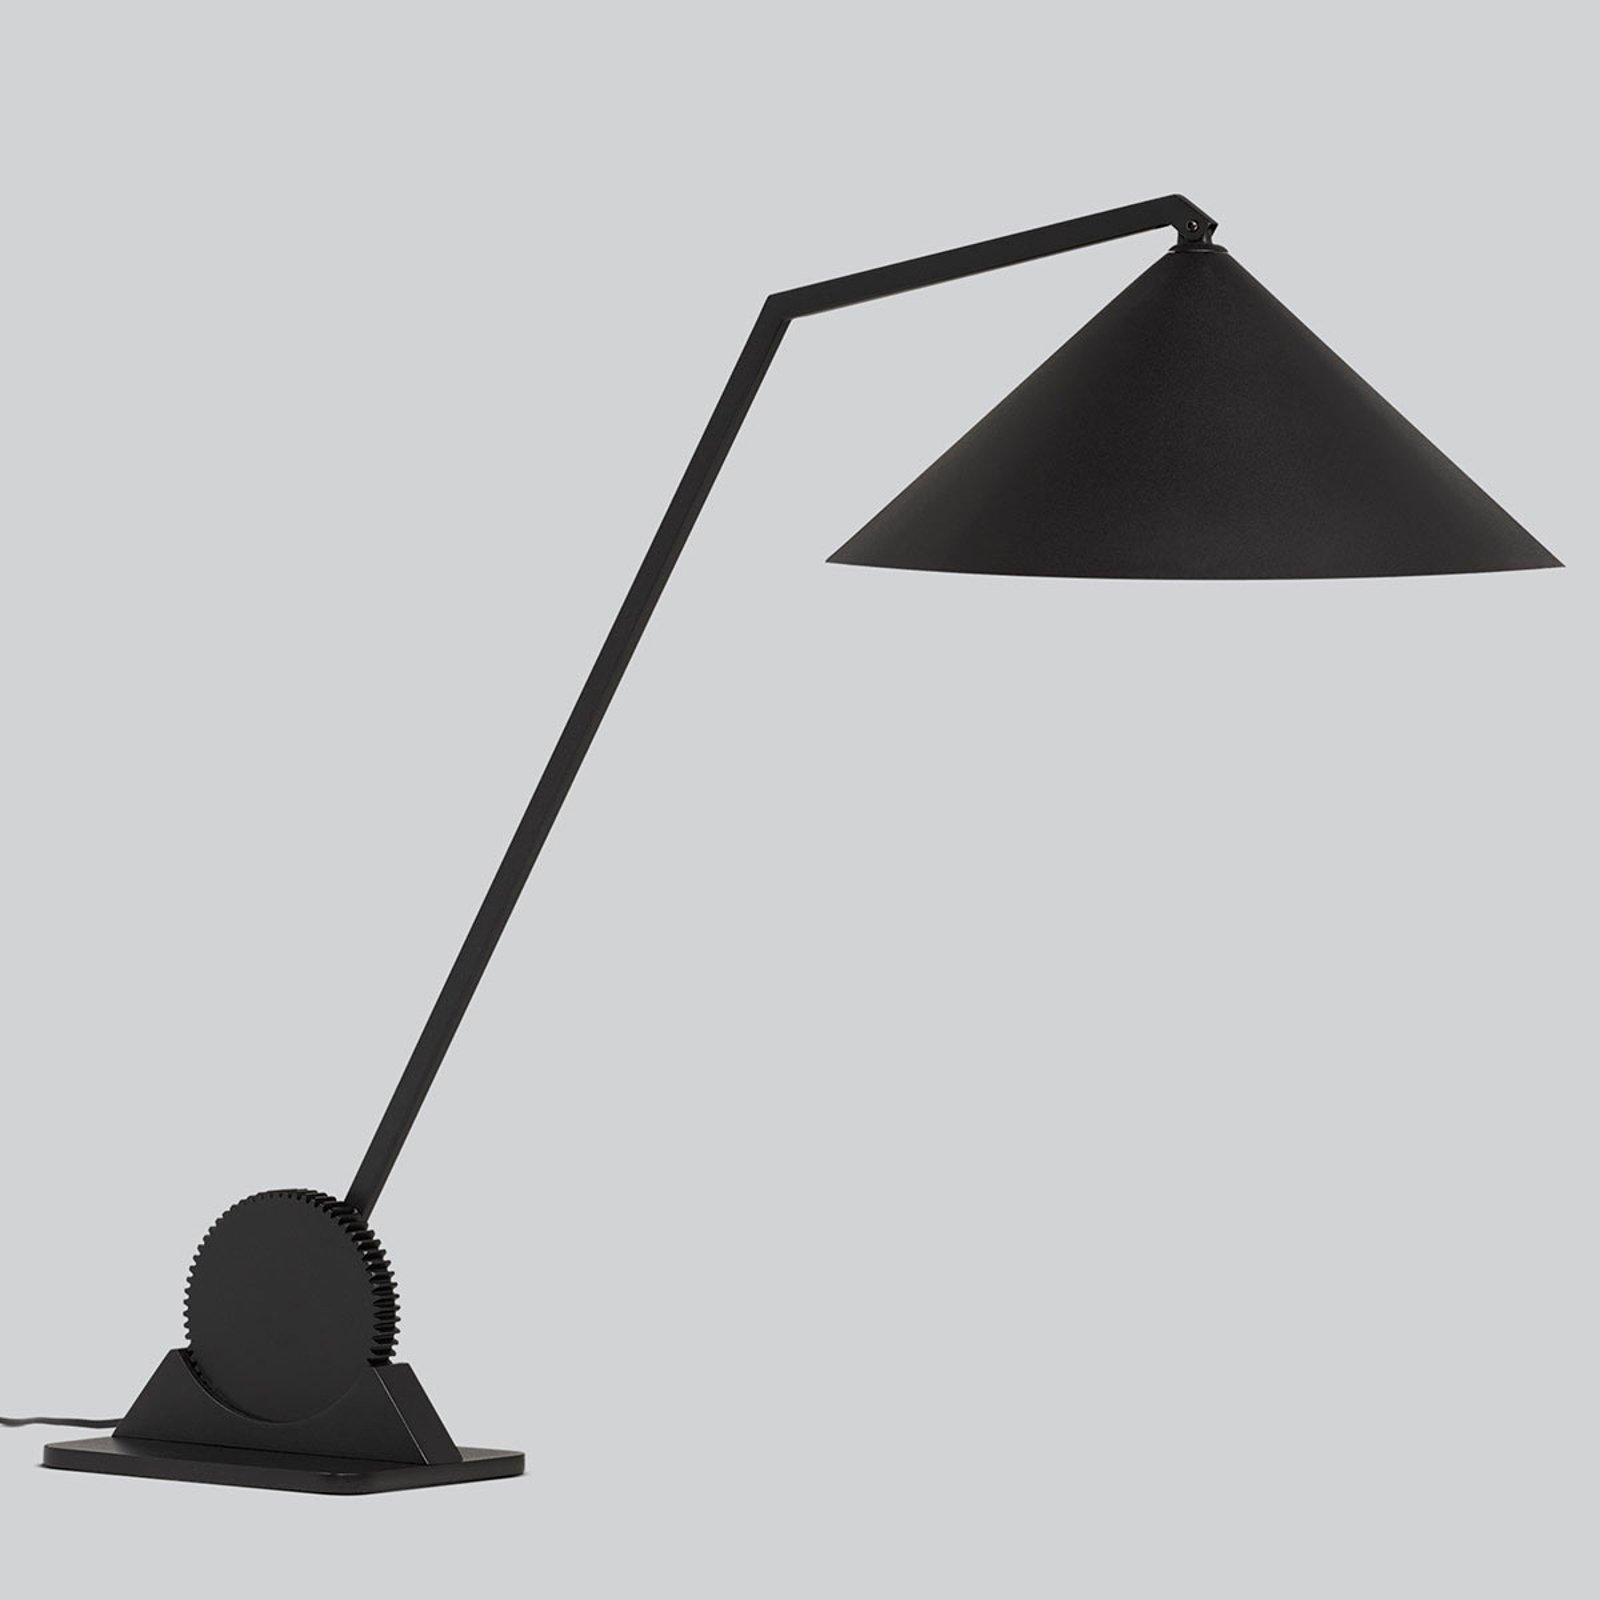 Northern Gear Table bordlampe, 1 lyskilde